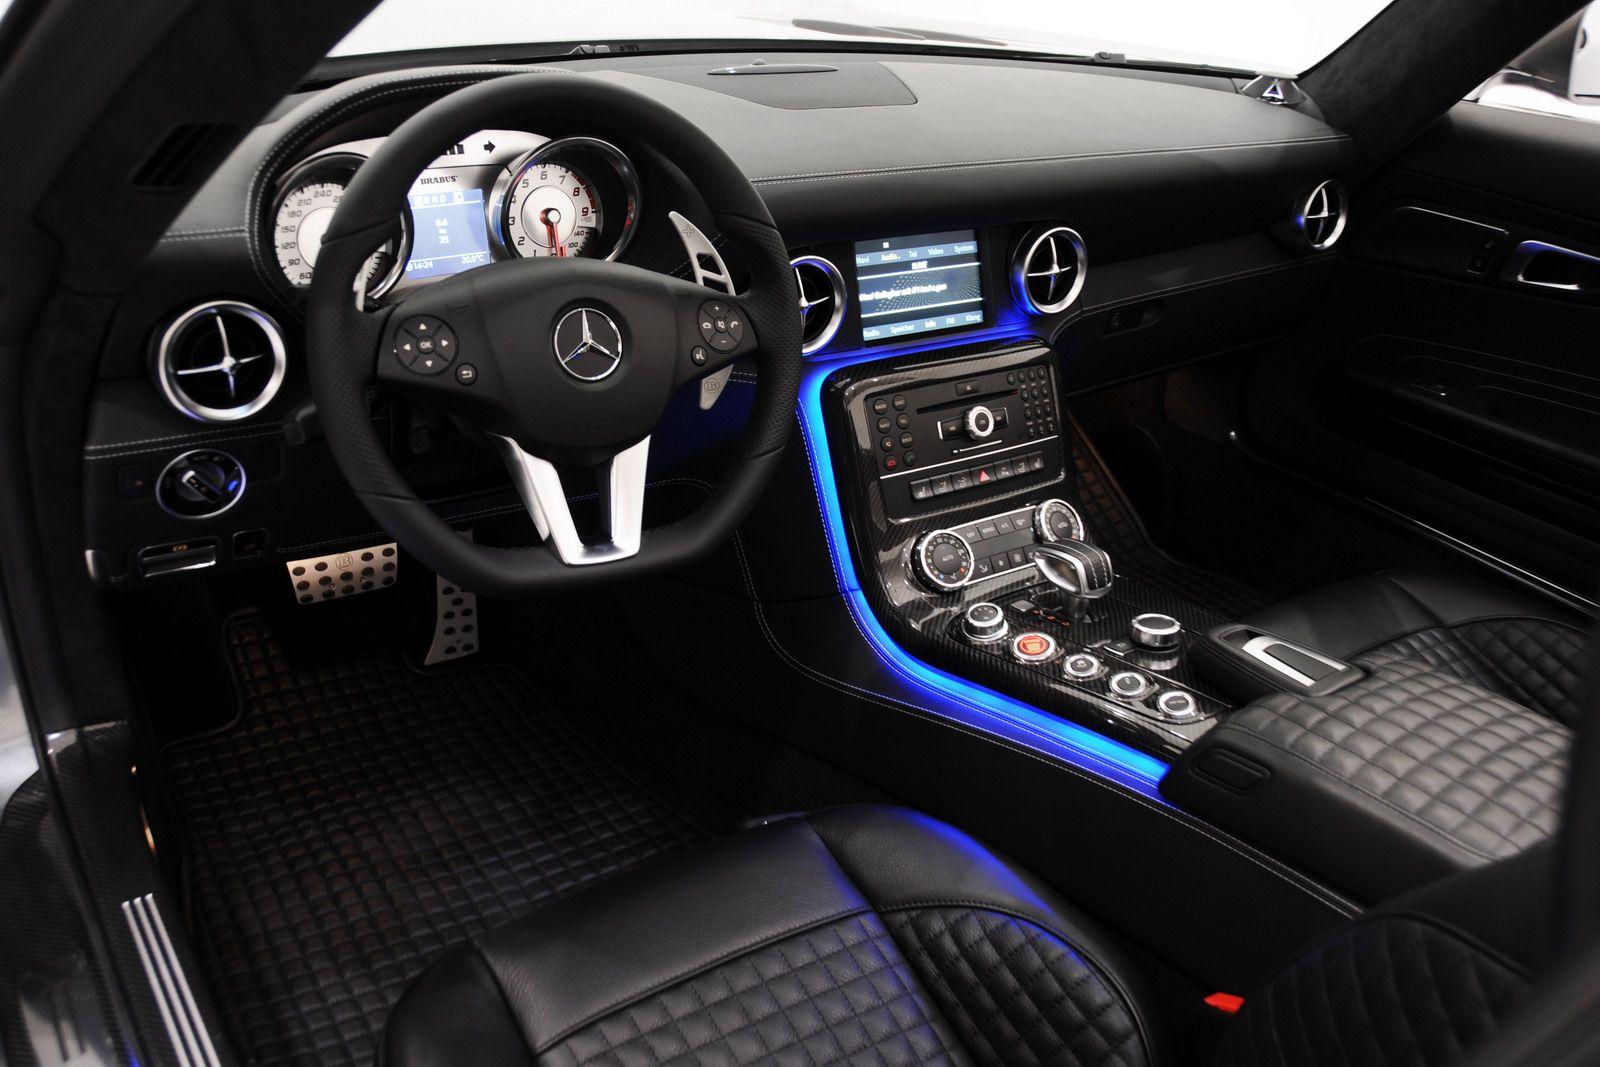 brabus unleashes 611hp mercedes benz sls amg roadster the - Mercedes Benz Sls Amg Interior